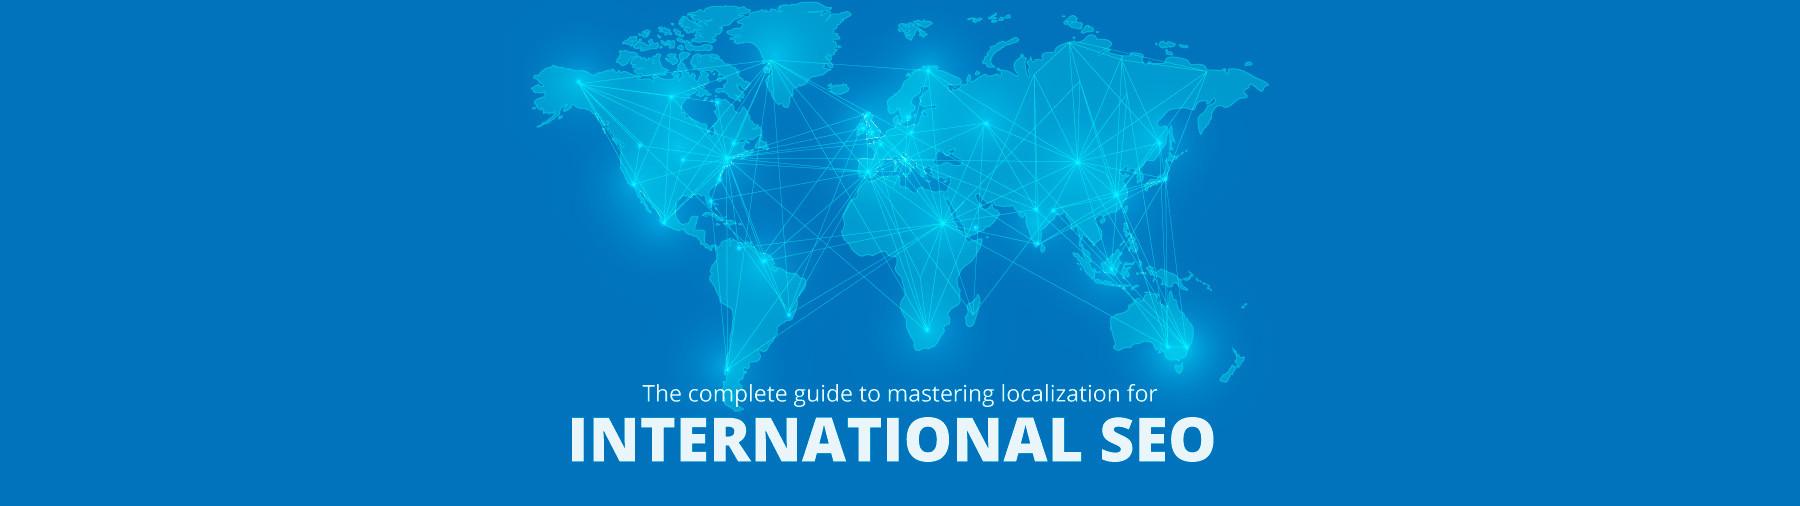 Mastering Localization For International SEO